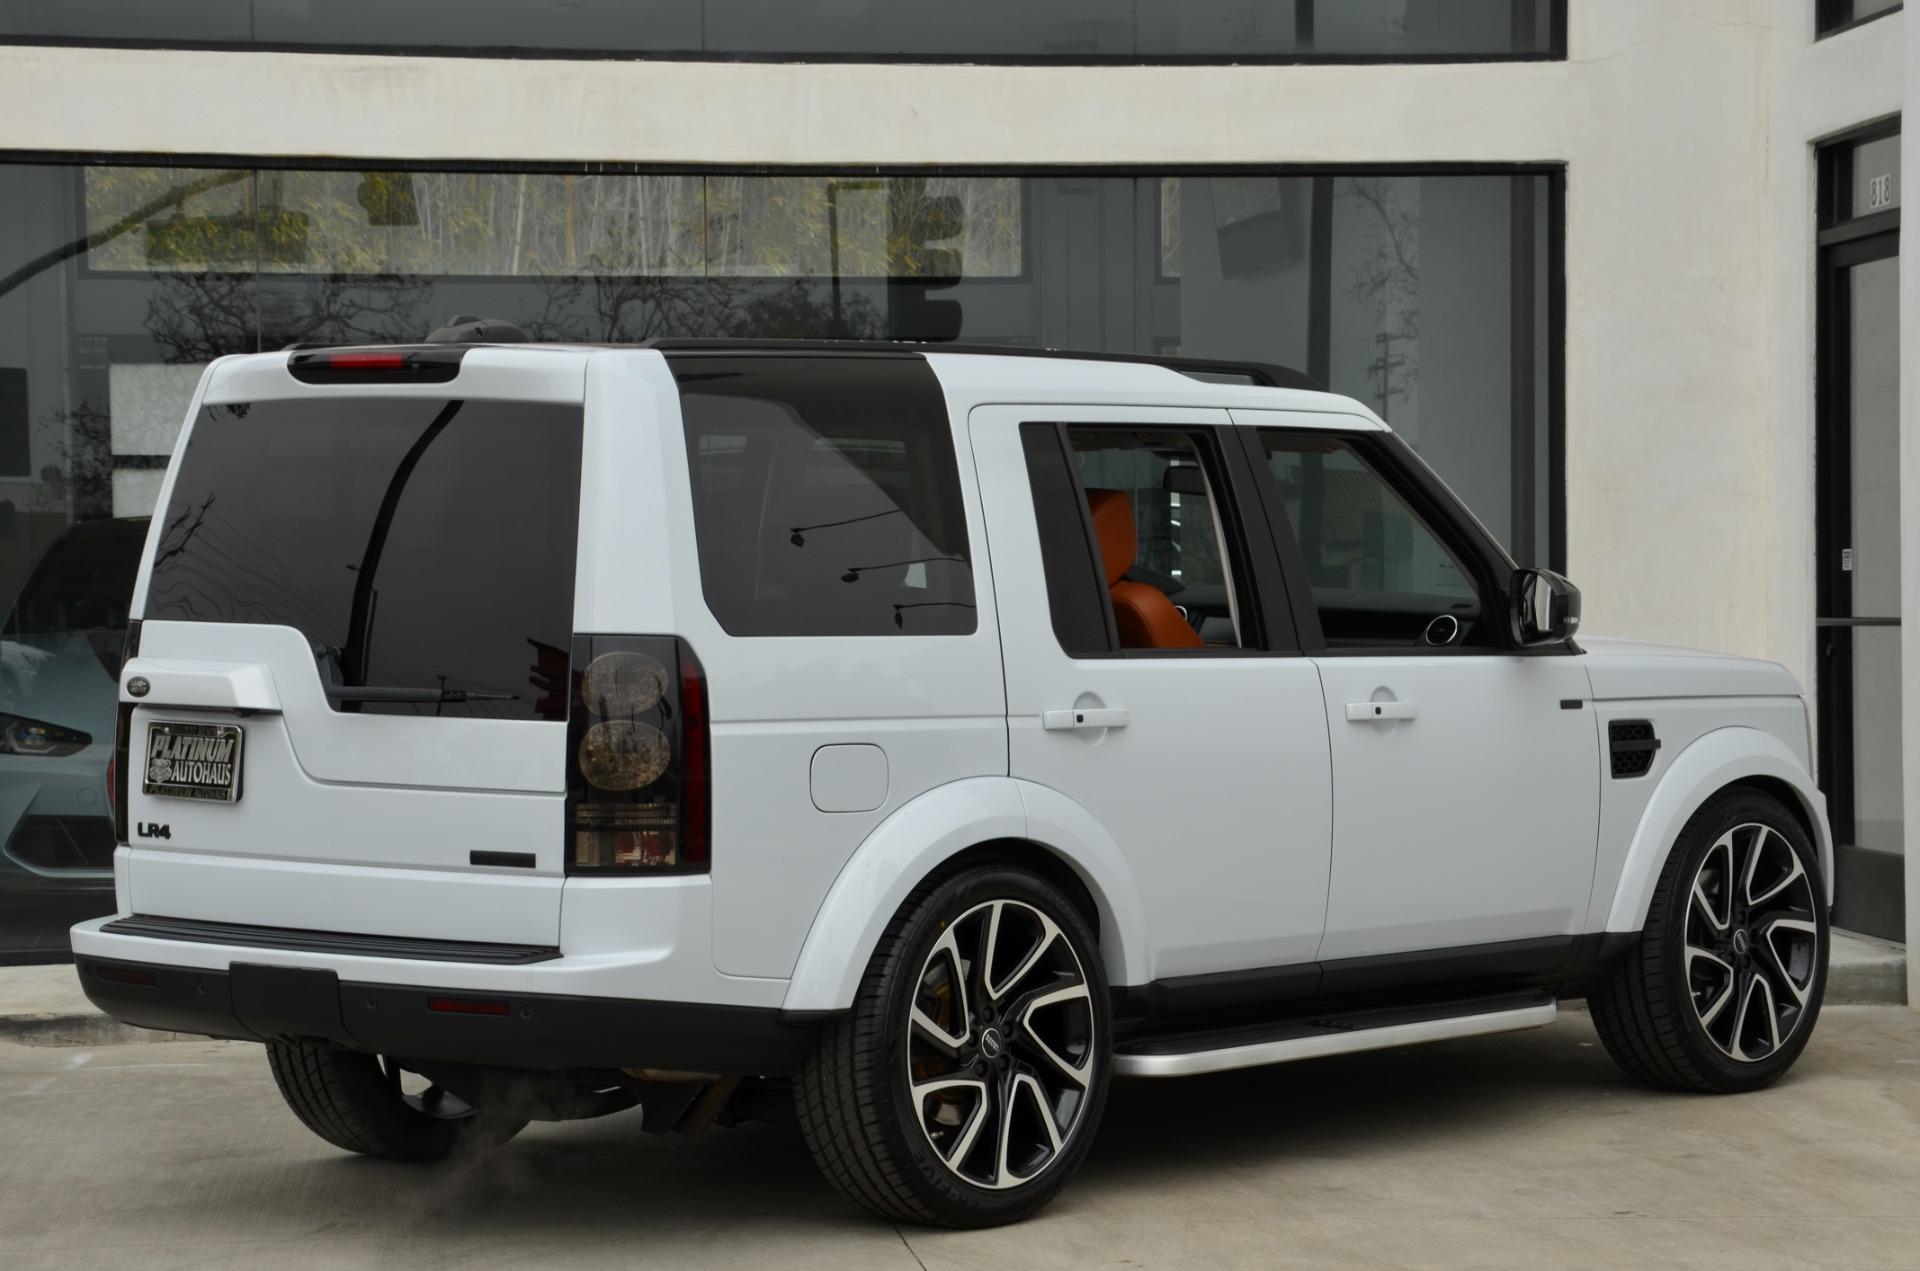 Land Rover For Sale Near Me >> 2016 Land Rover LR4 HSE LUX *** LANDMARK EDITION *** Stock # 6181 for sale near Redondo Beach ...